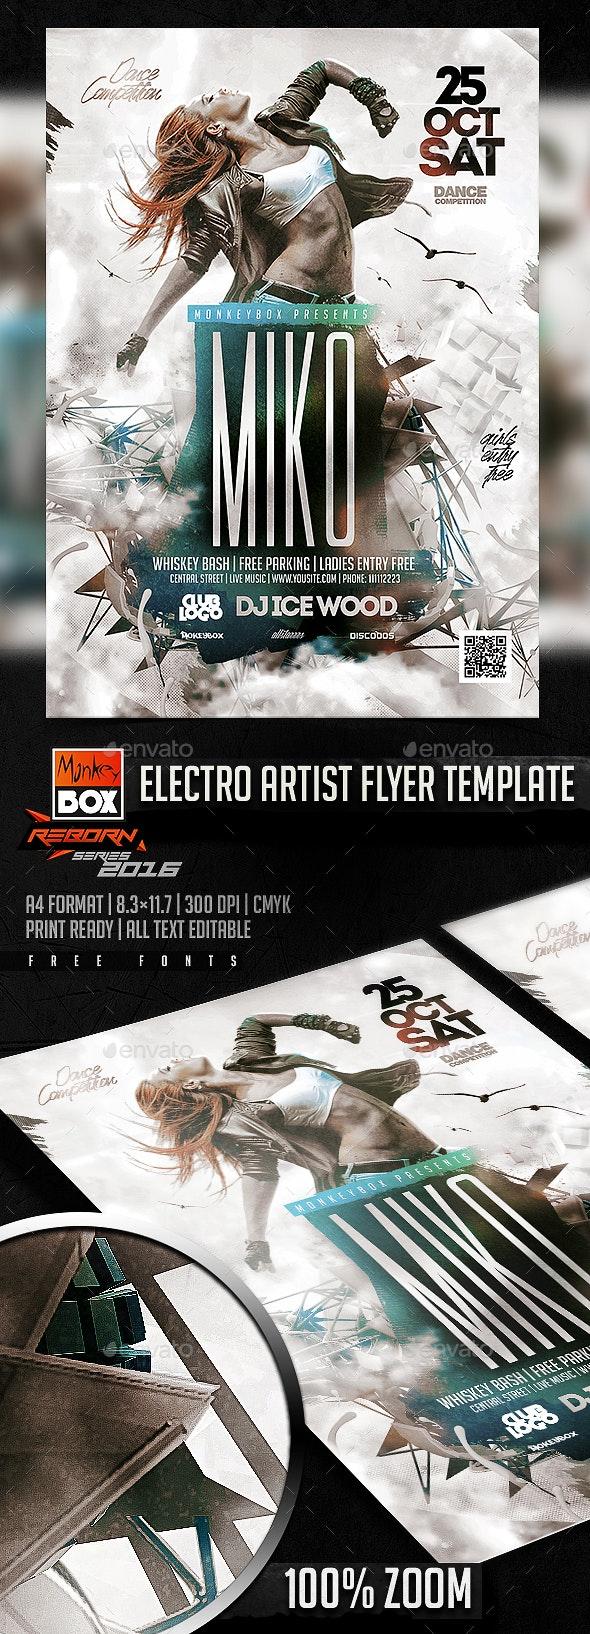 Electro Artist Flyer Template - Flyers Print Templates